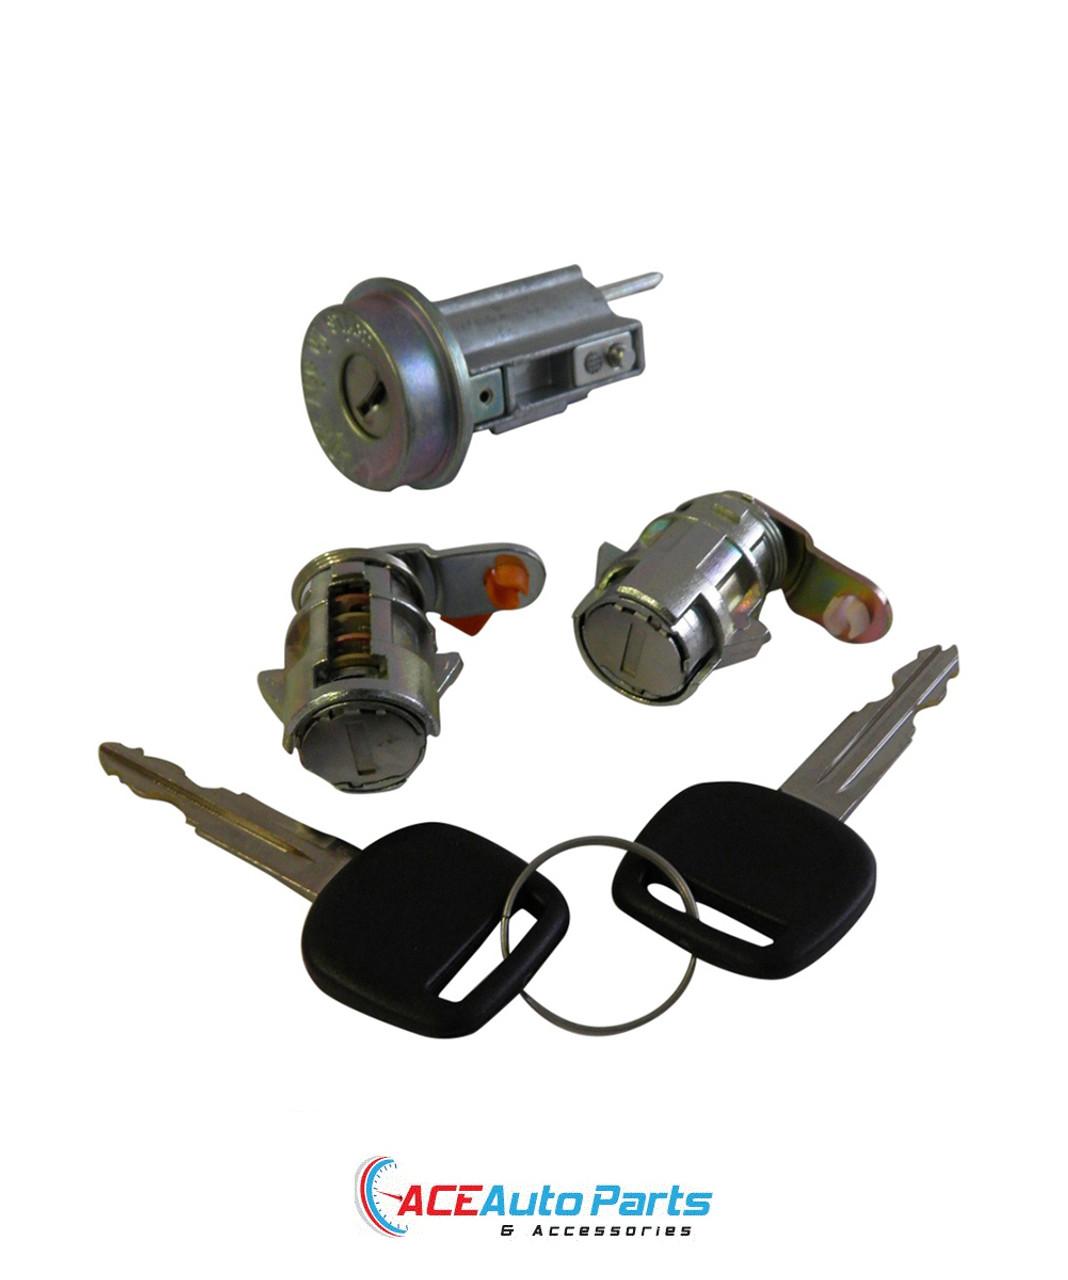 Ignition barrel + door locks for Toyota Hilux 1988-1997